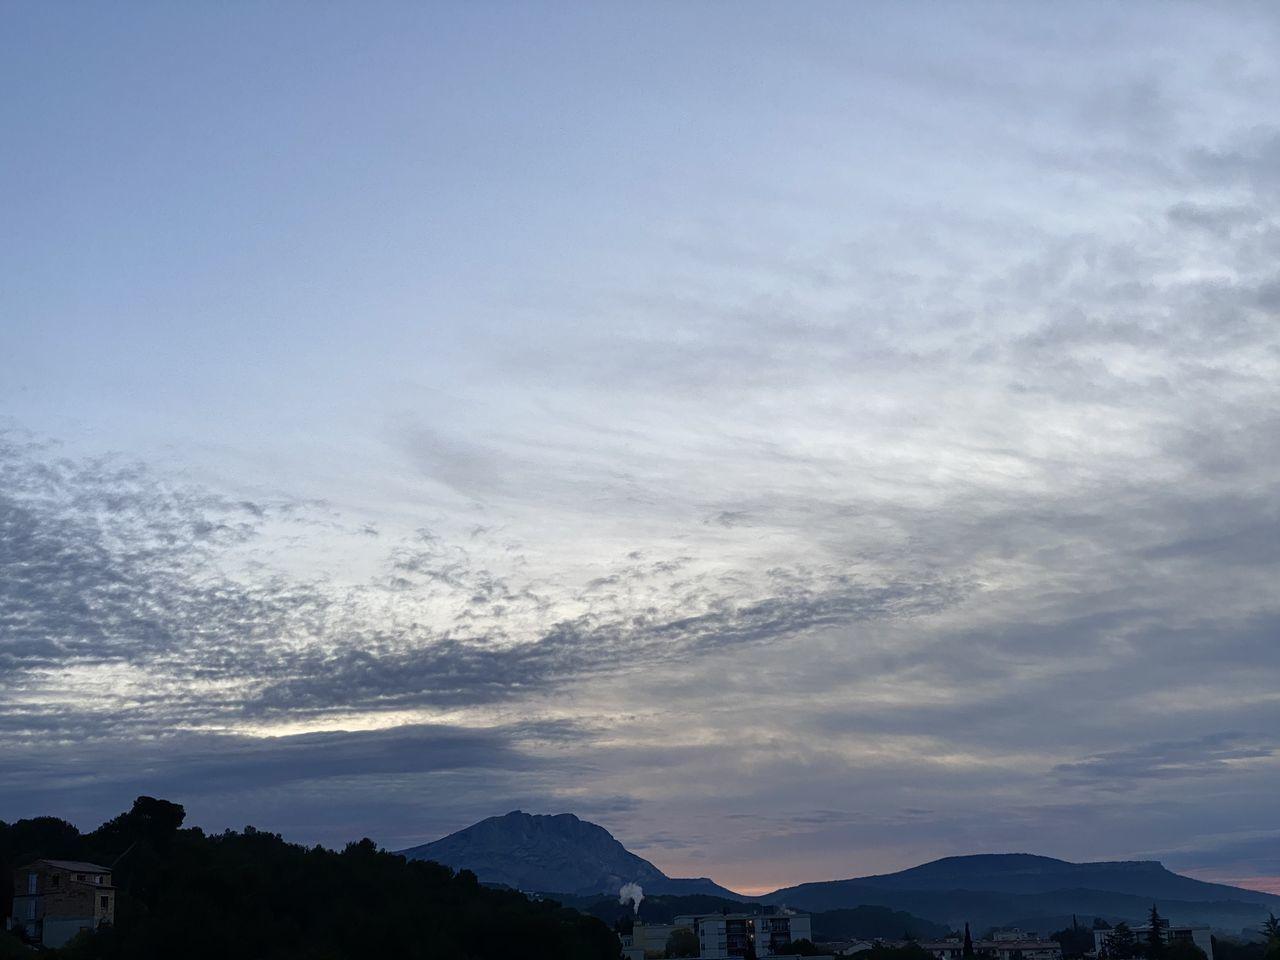 cloud - sky, sky, mountain, scenics - nature, beauty in nature, tranquility, tranquil scene, mountain range, nature, sunset, silhouette, no people, non-urban scene, idyllic, outdoors, environment, landscape, day, building exterior, mountain peak